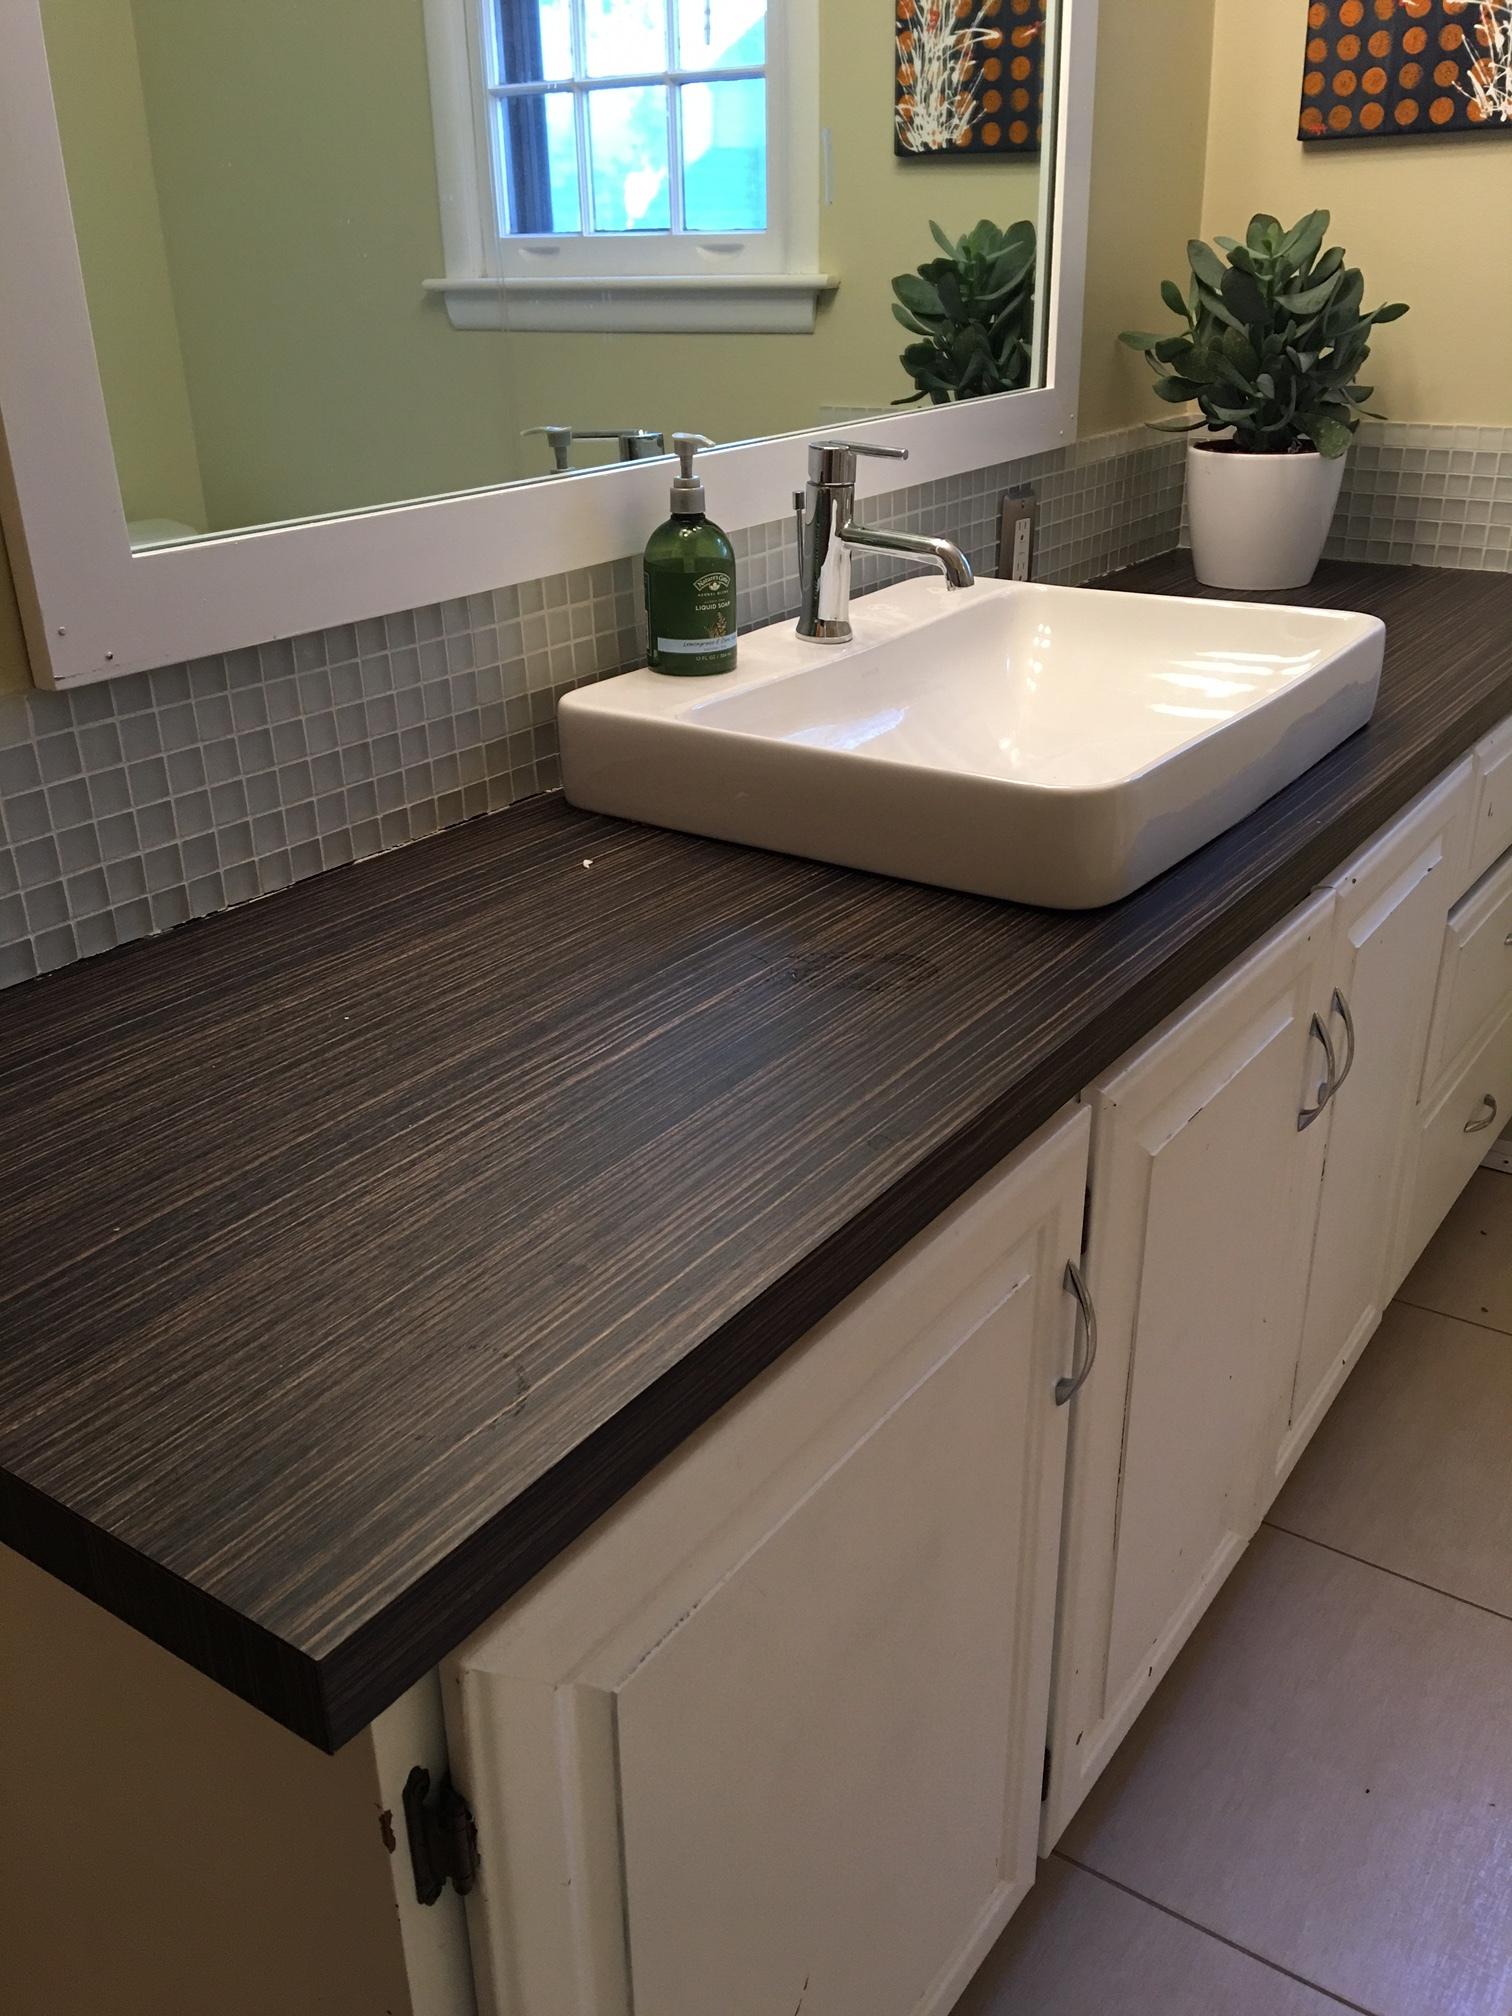 Bathroom IKEA counter before